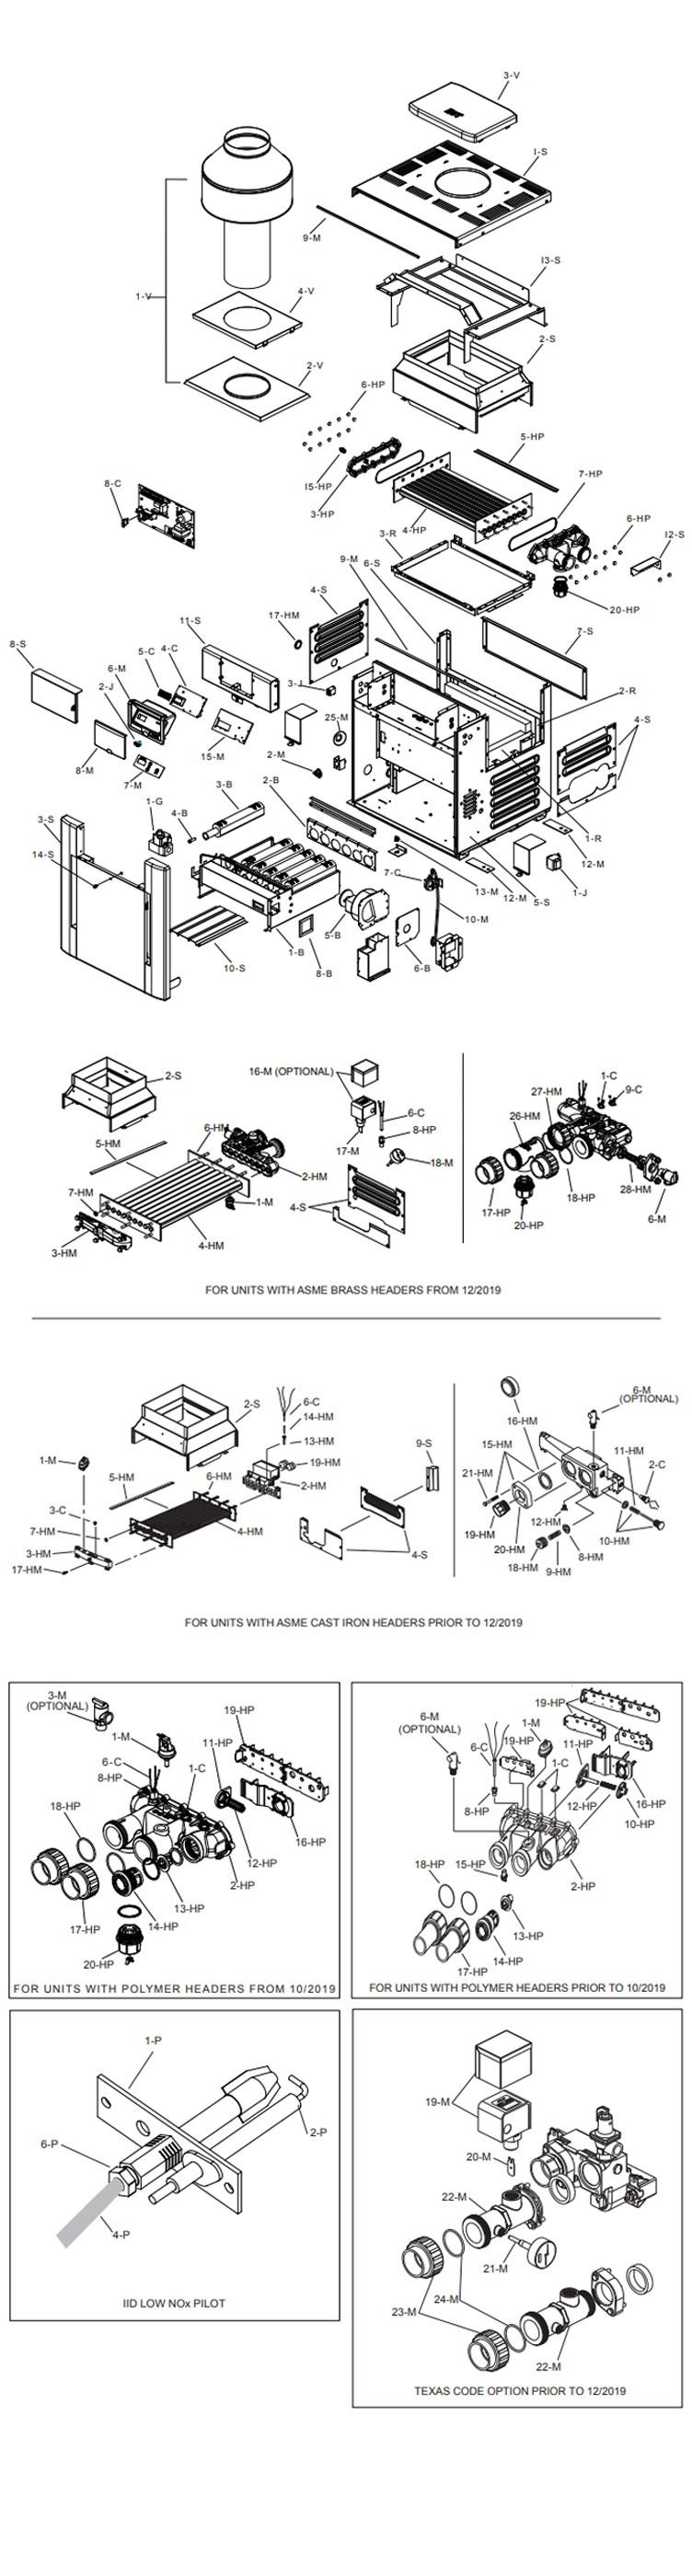 Raypak Digital Low NOX ASME Certified Natural Gas Commercial Swimming Pool Heater 333k BTU | C-R337A-EN-C 009294 Parts Schematic